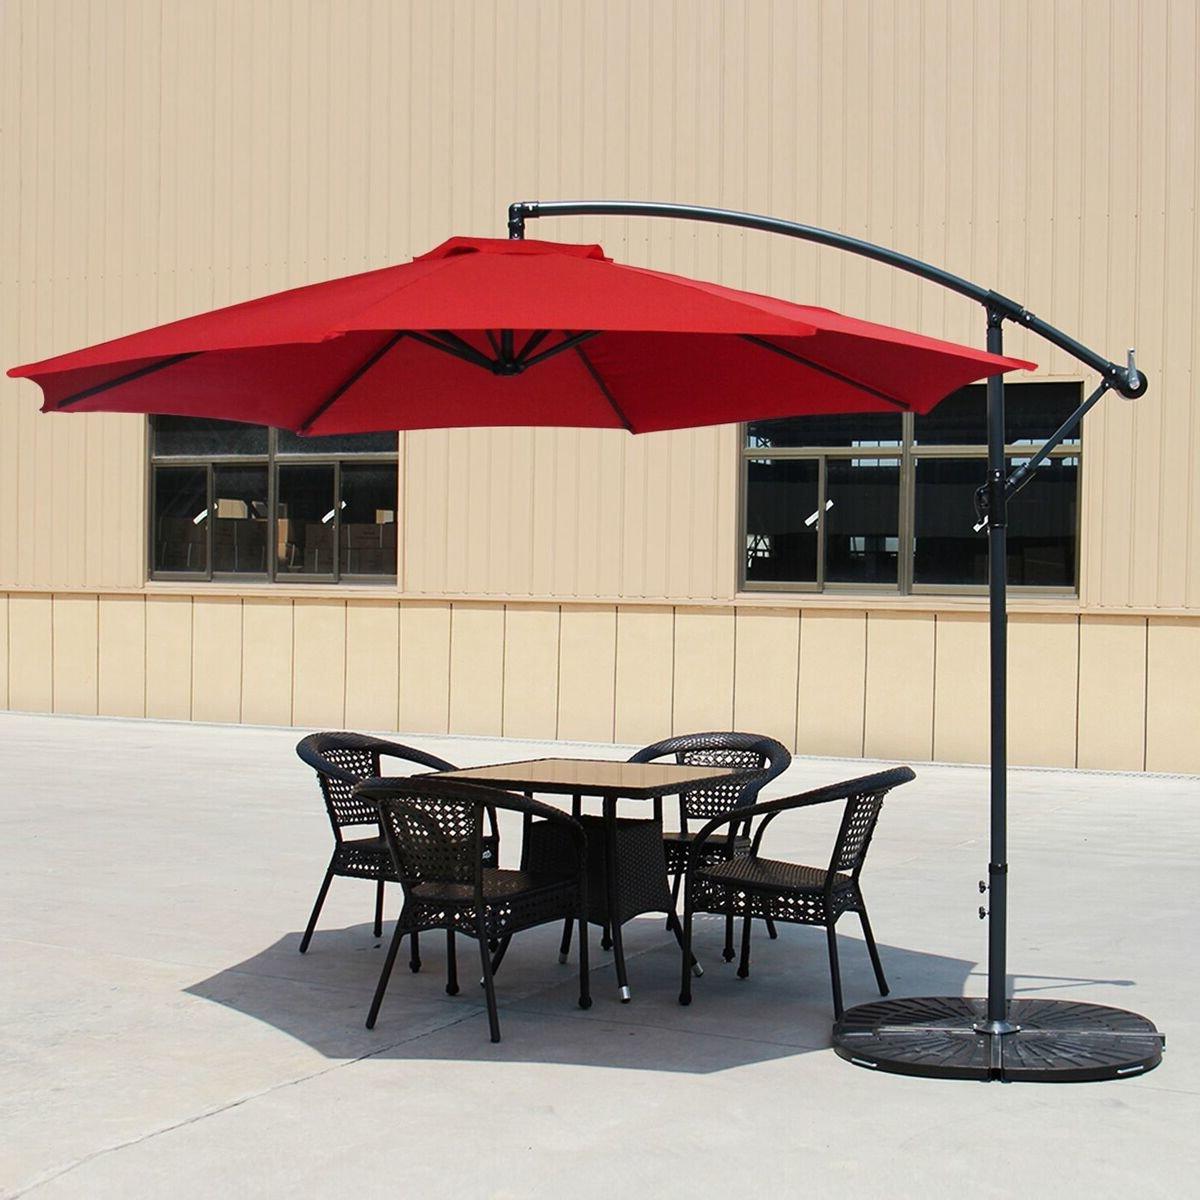 Hilma Solar Cantilever Umbrellas In Most Recent Carillon 10' Cantilever Umbrella (Gallery 3 of 20)